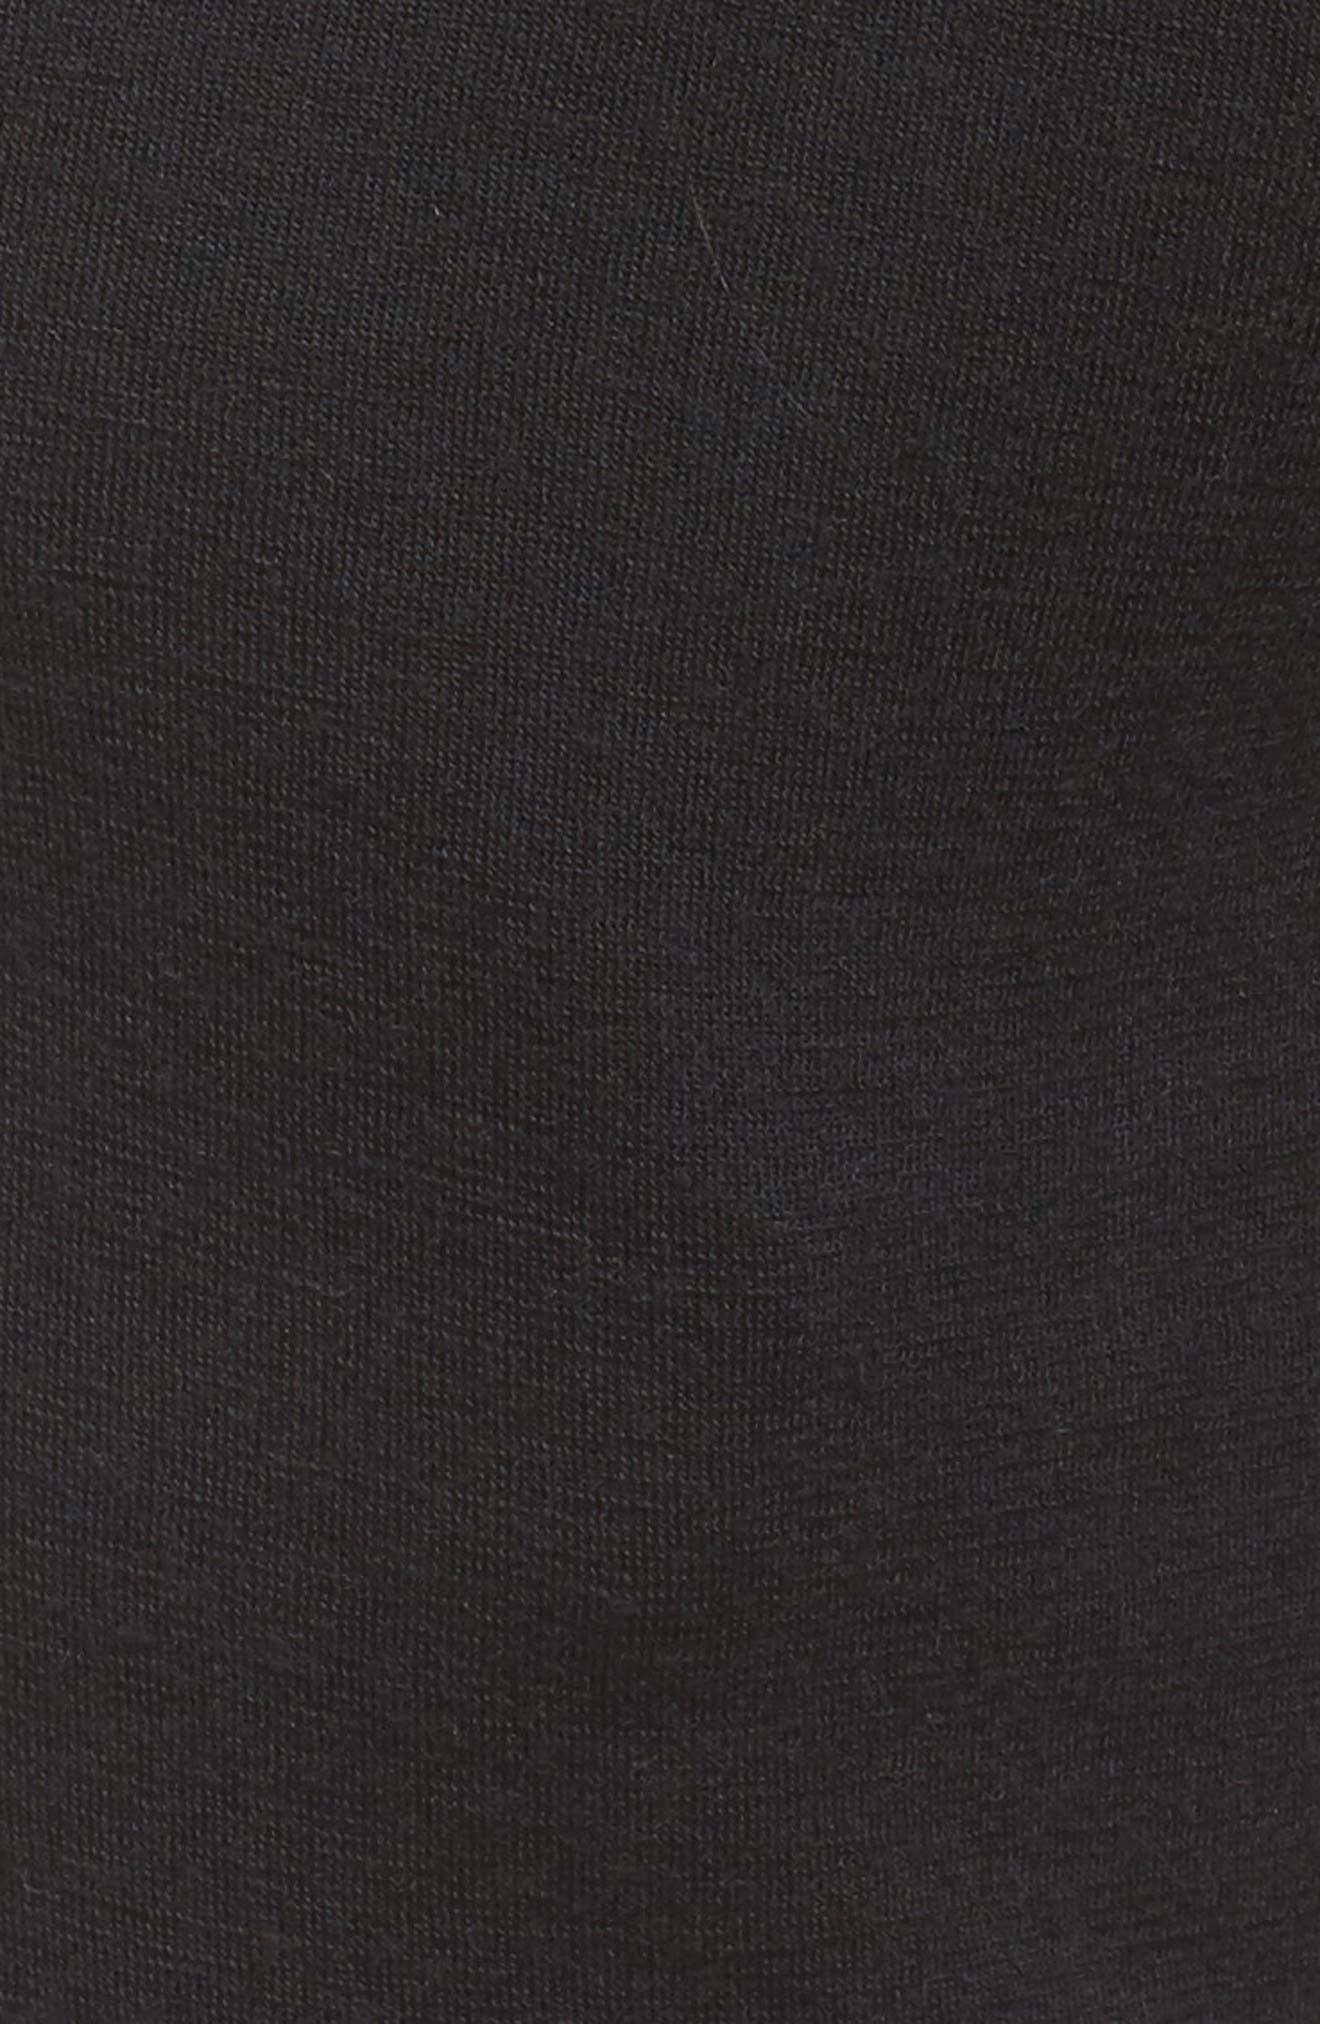 Lizy Track Pants,                             Alternate thumbnail 7, color,                             Black